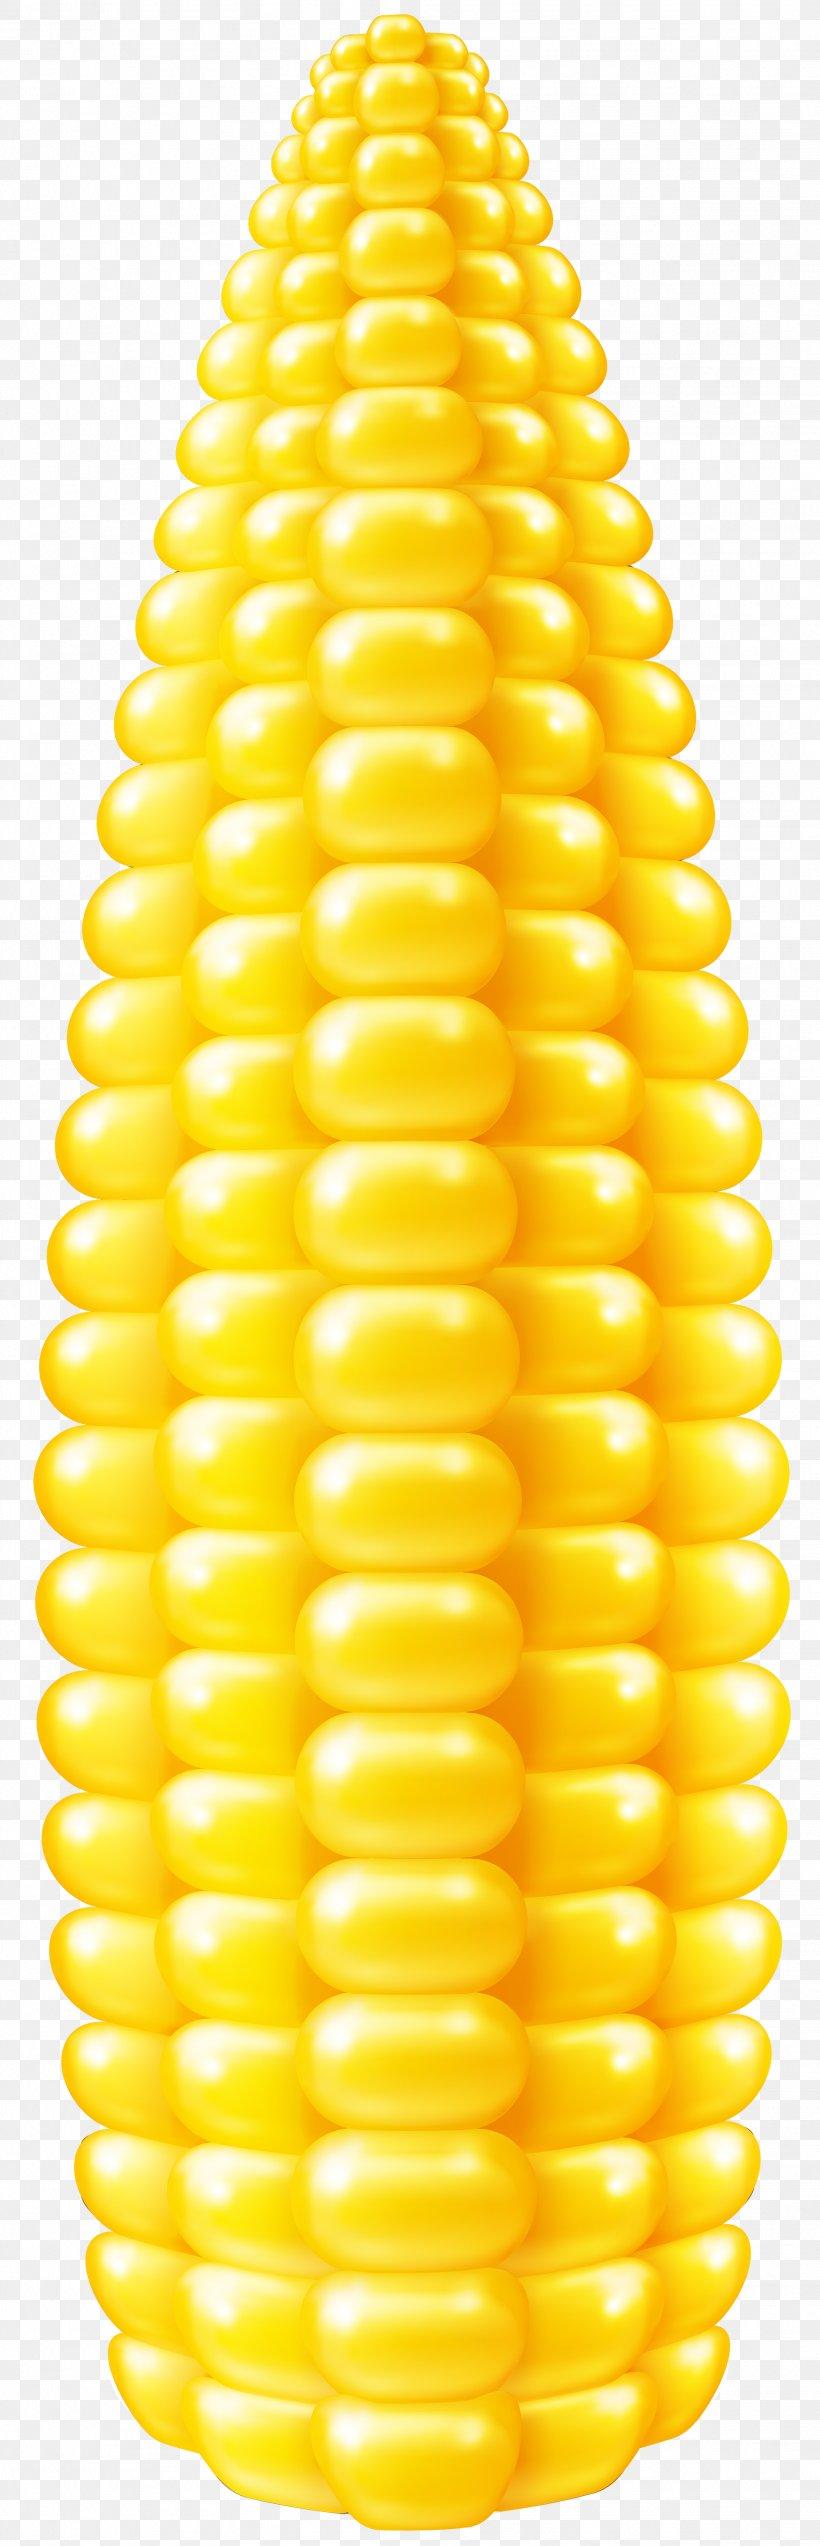 Corn On The Cob Maize Stock Illustration Corncob, PNG, 1932x6000px, Corn On The Cob, Baby Corn, Commodity, Corn Kernel, Corn Kernels Download Free